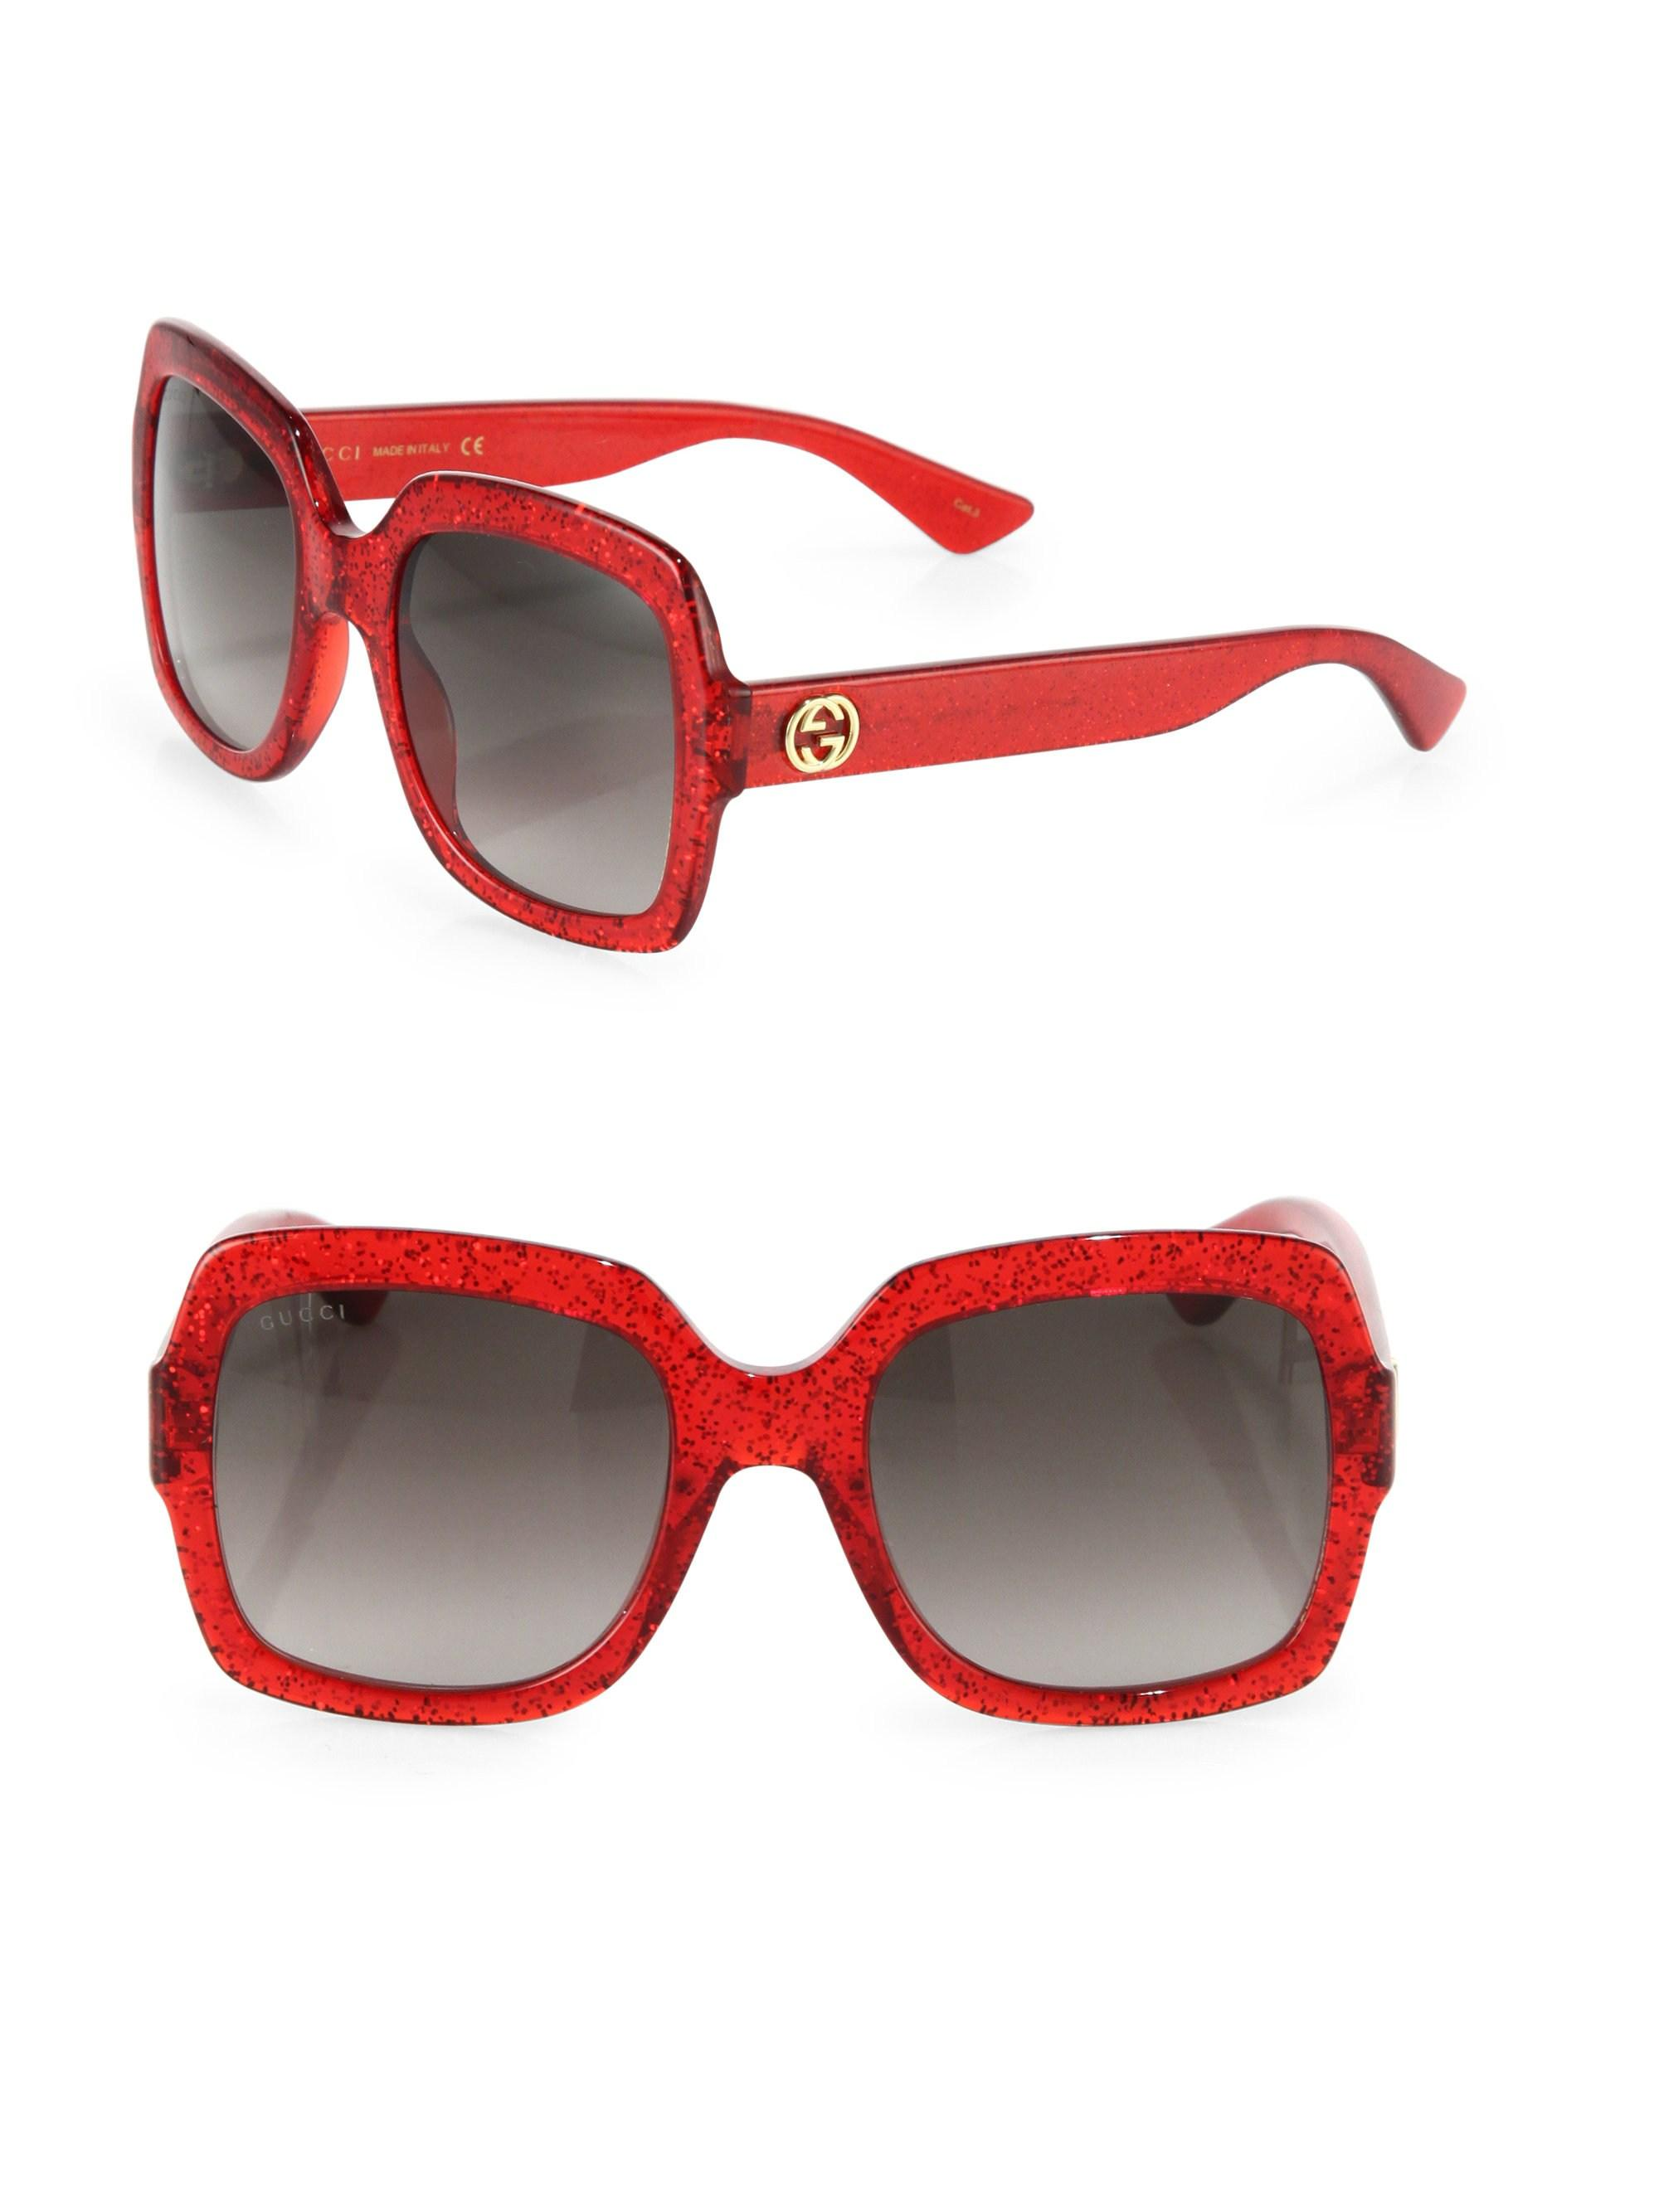 ae60222dcd4 Lyst - Gucci 54mm Oversized Glitter Square Sunglasses in Red